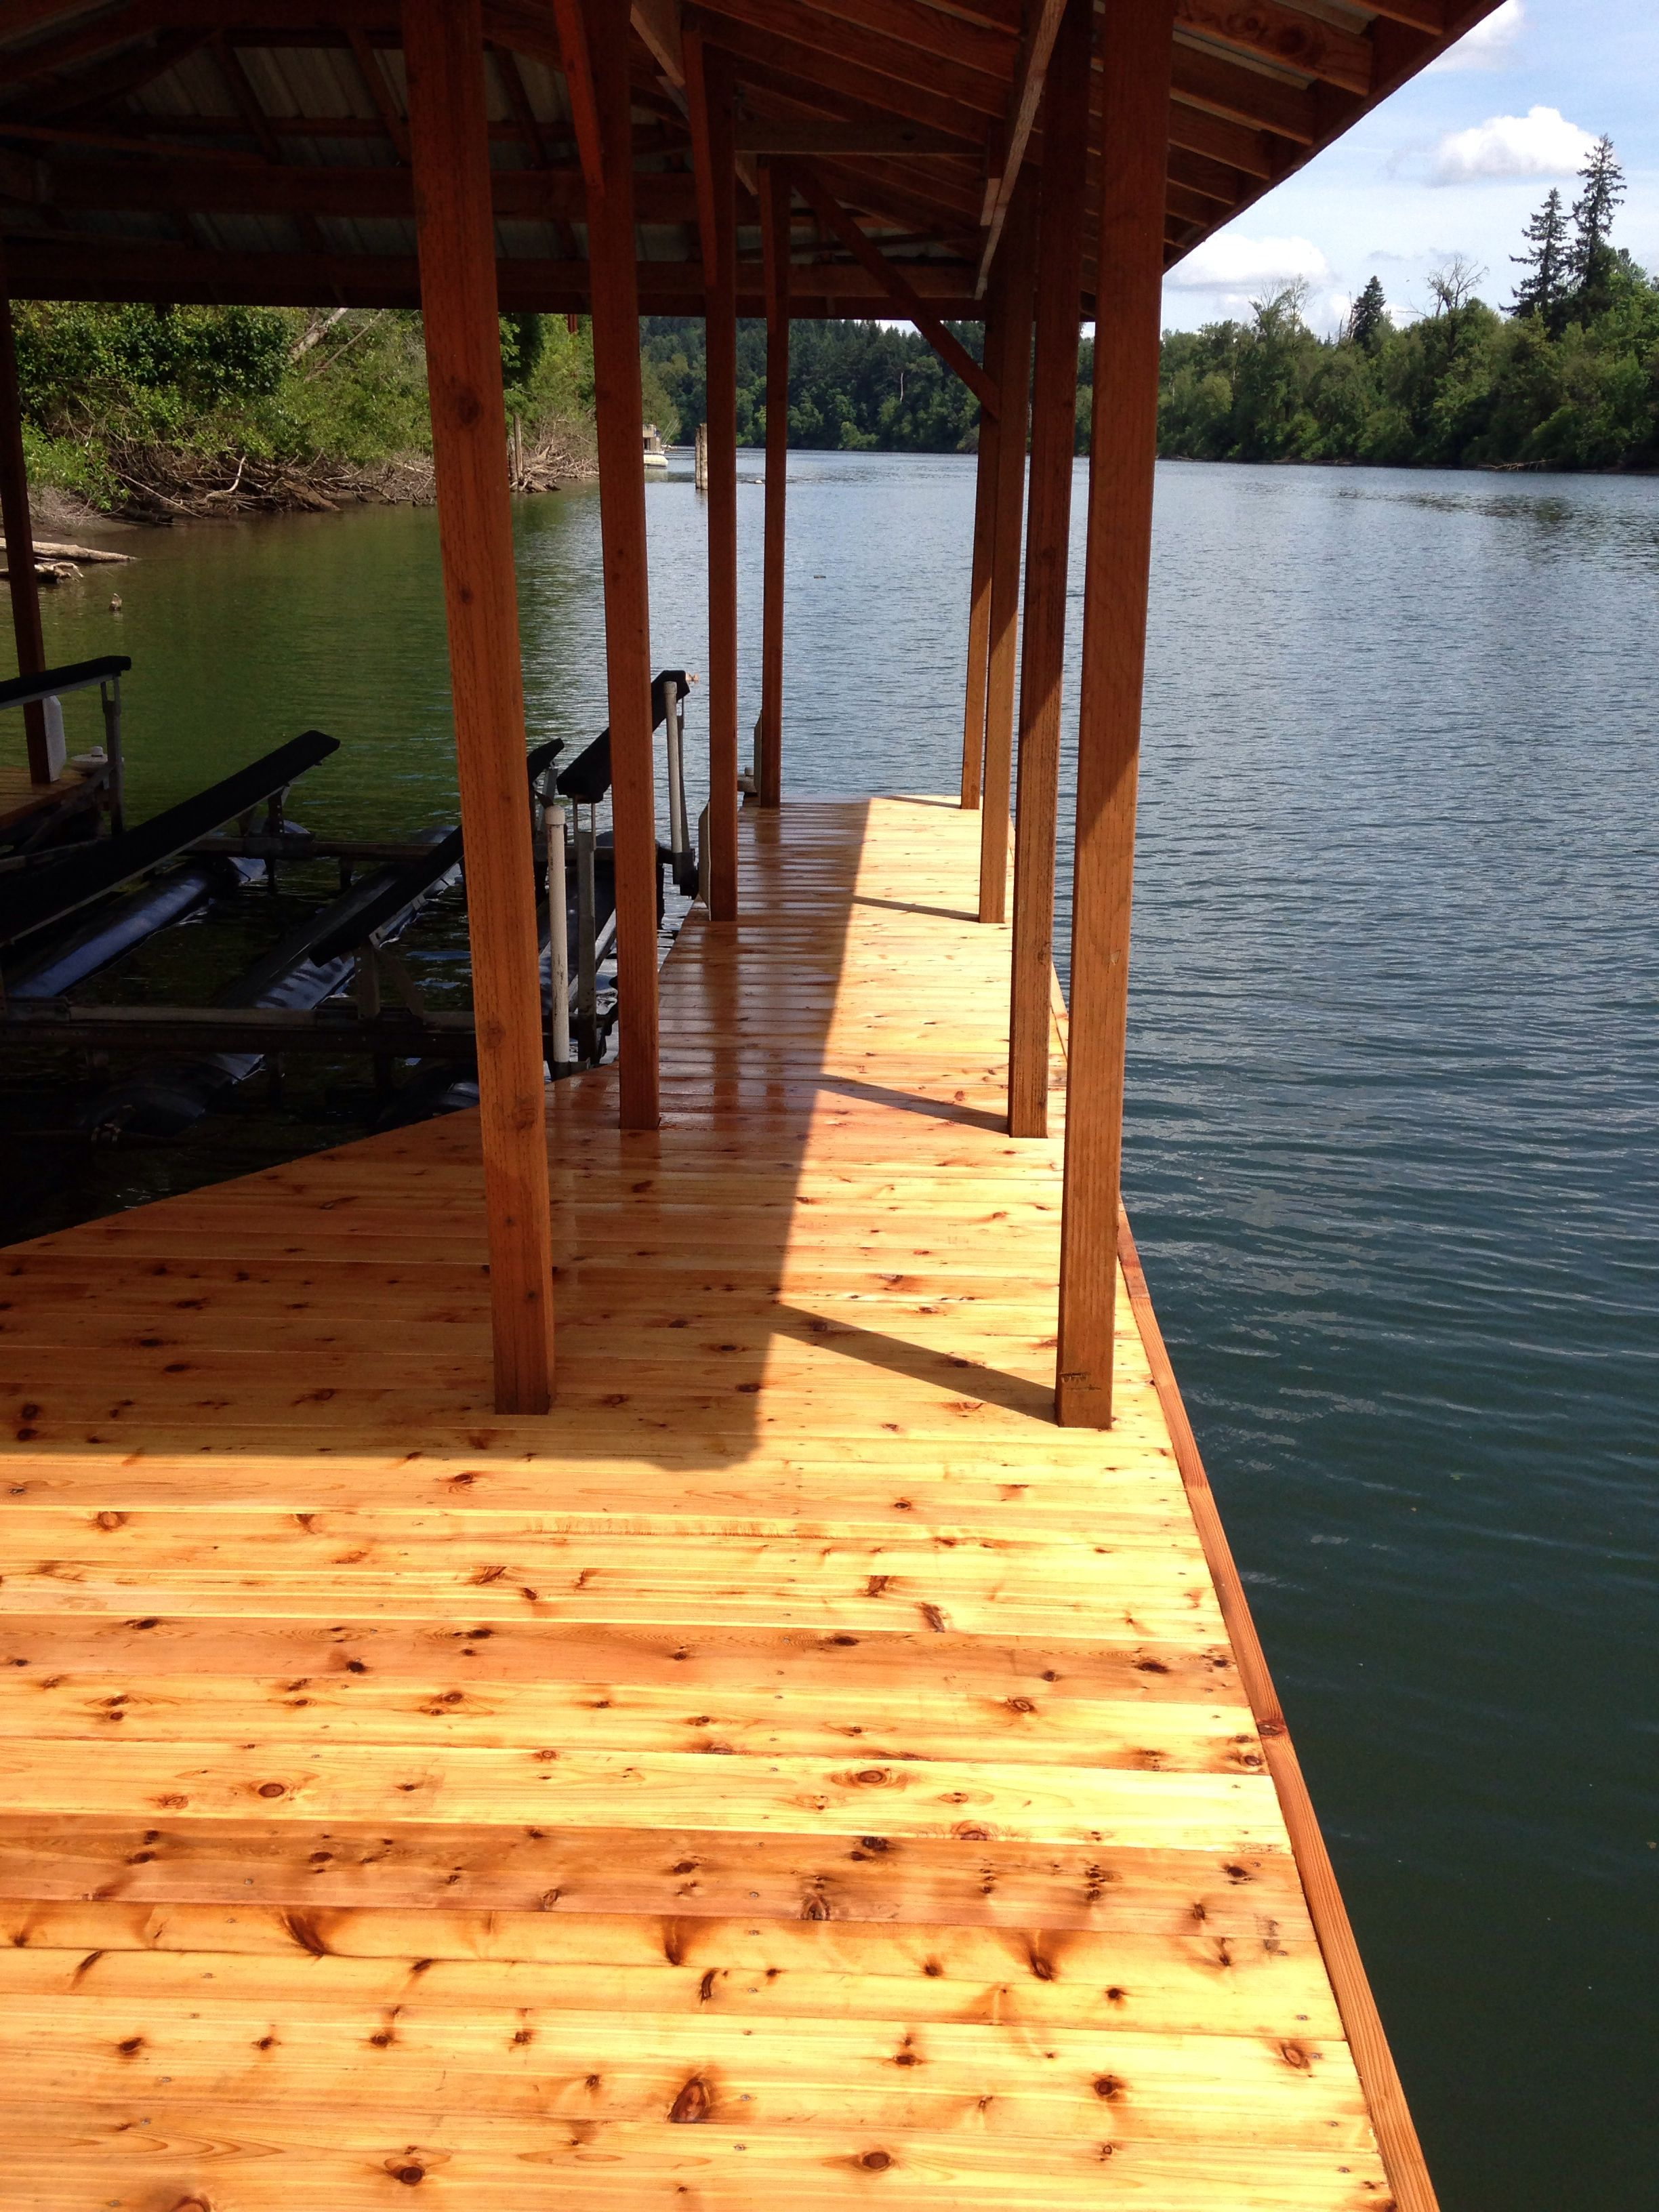 Custom boat dock on the willamette river in oregon built